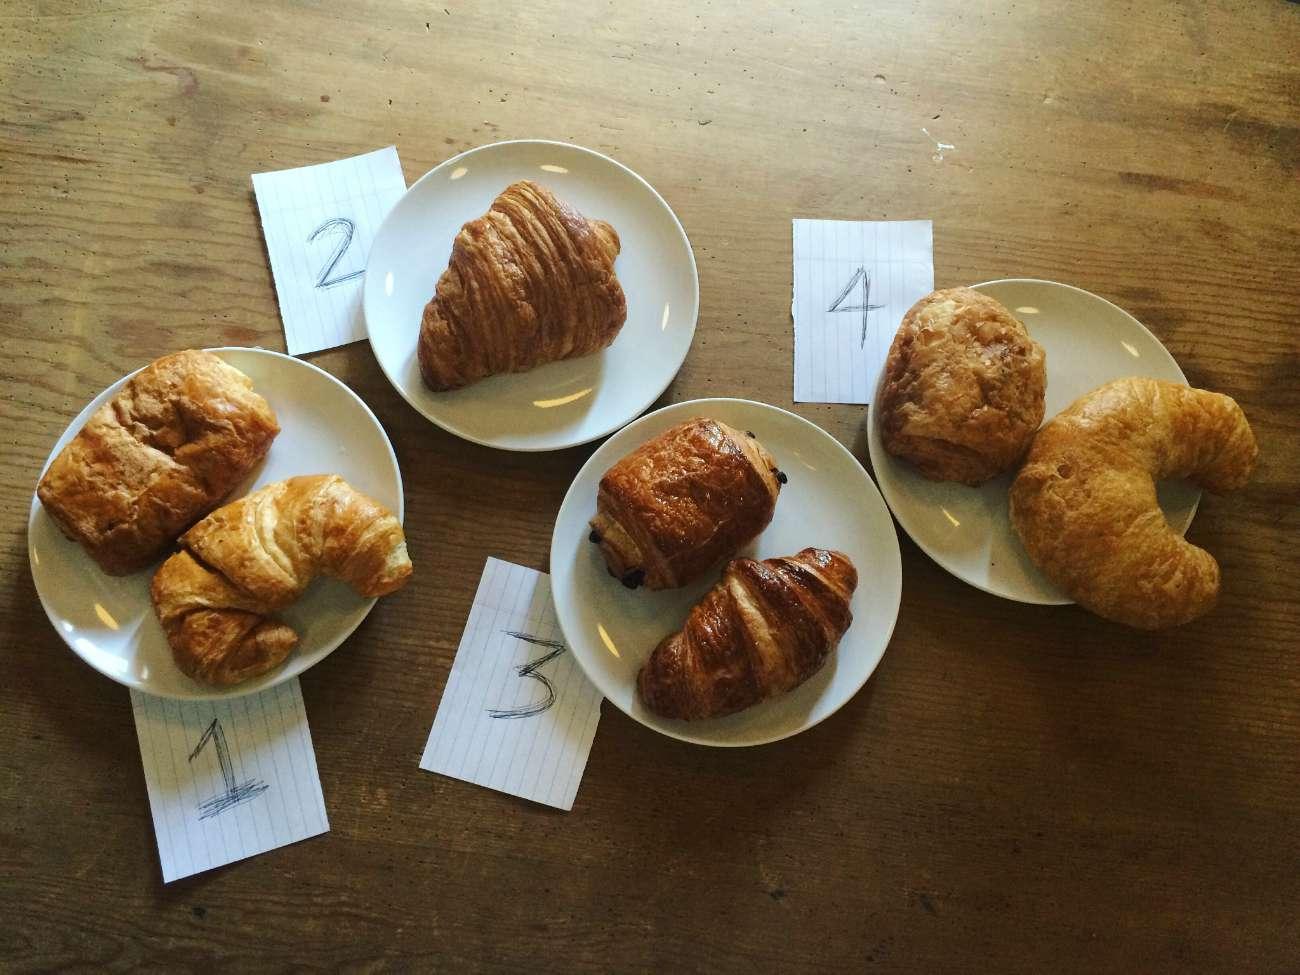 Charlotte Croissant Wars: 4 bakeries blind taste-tested and ranked